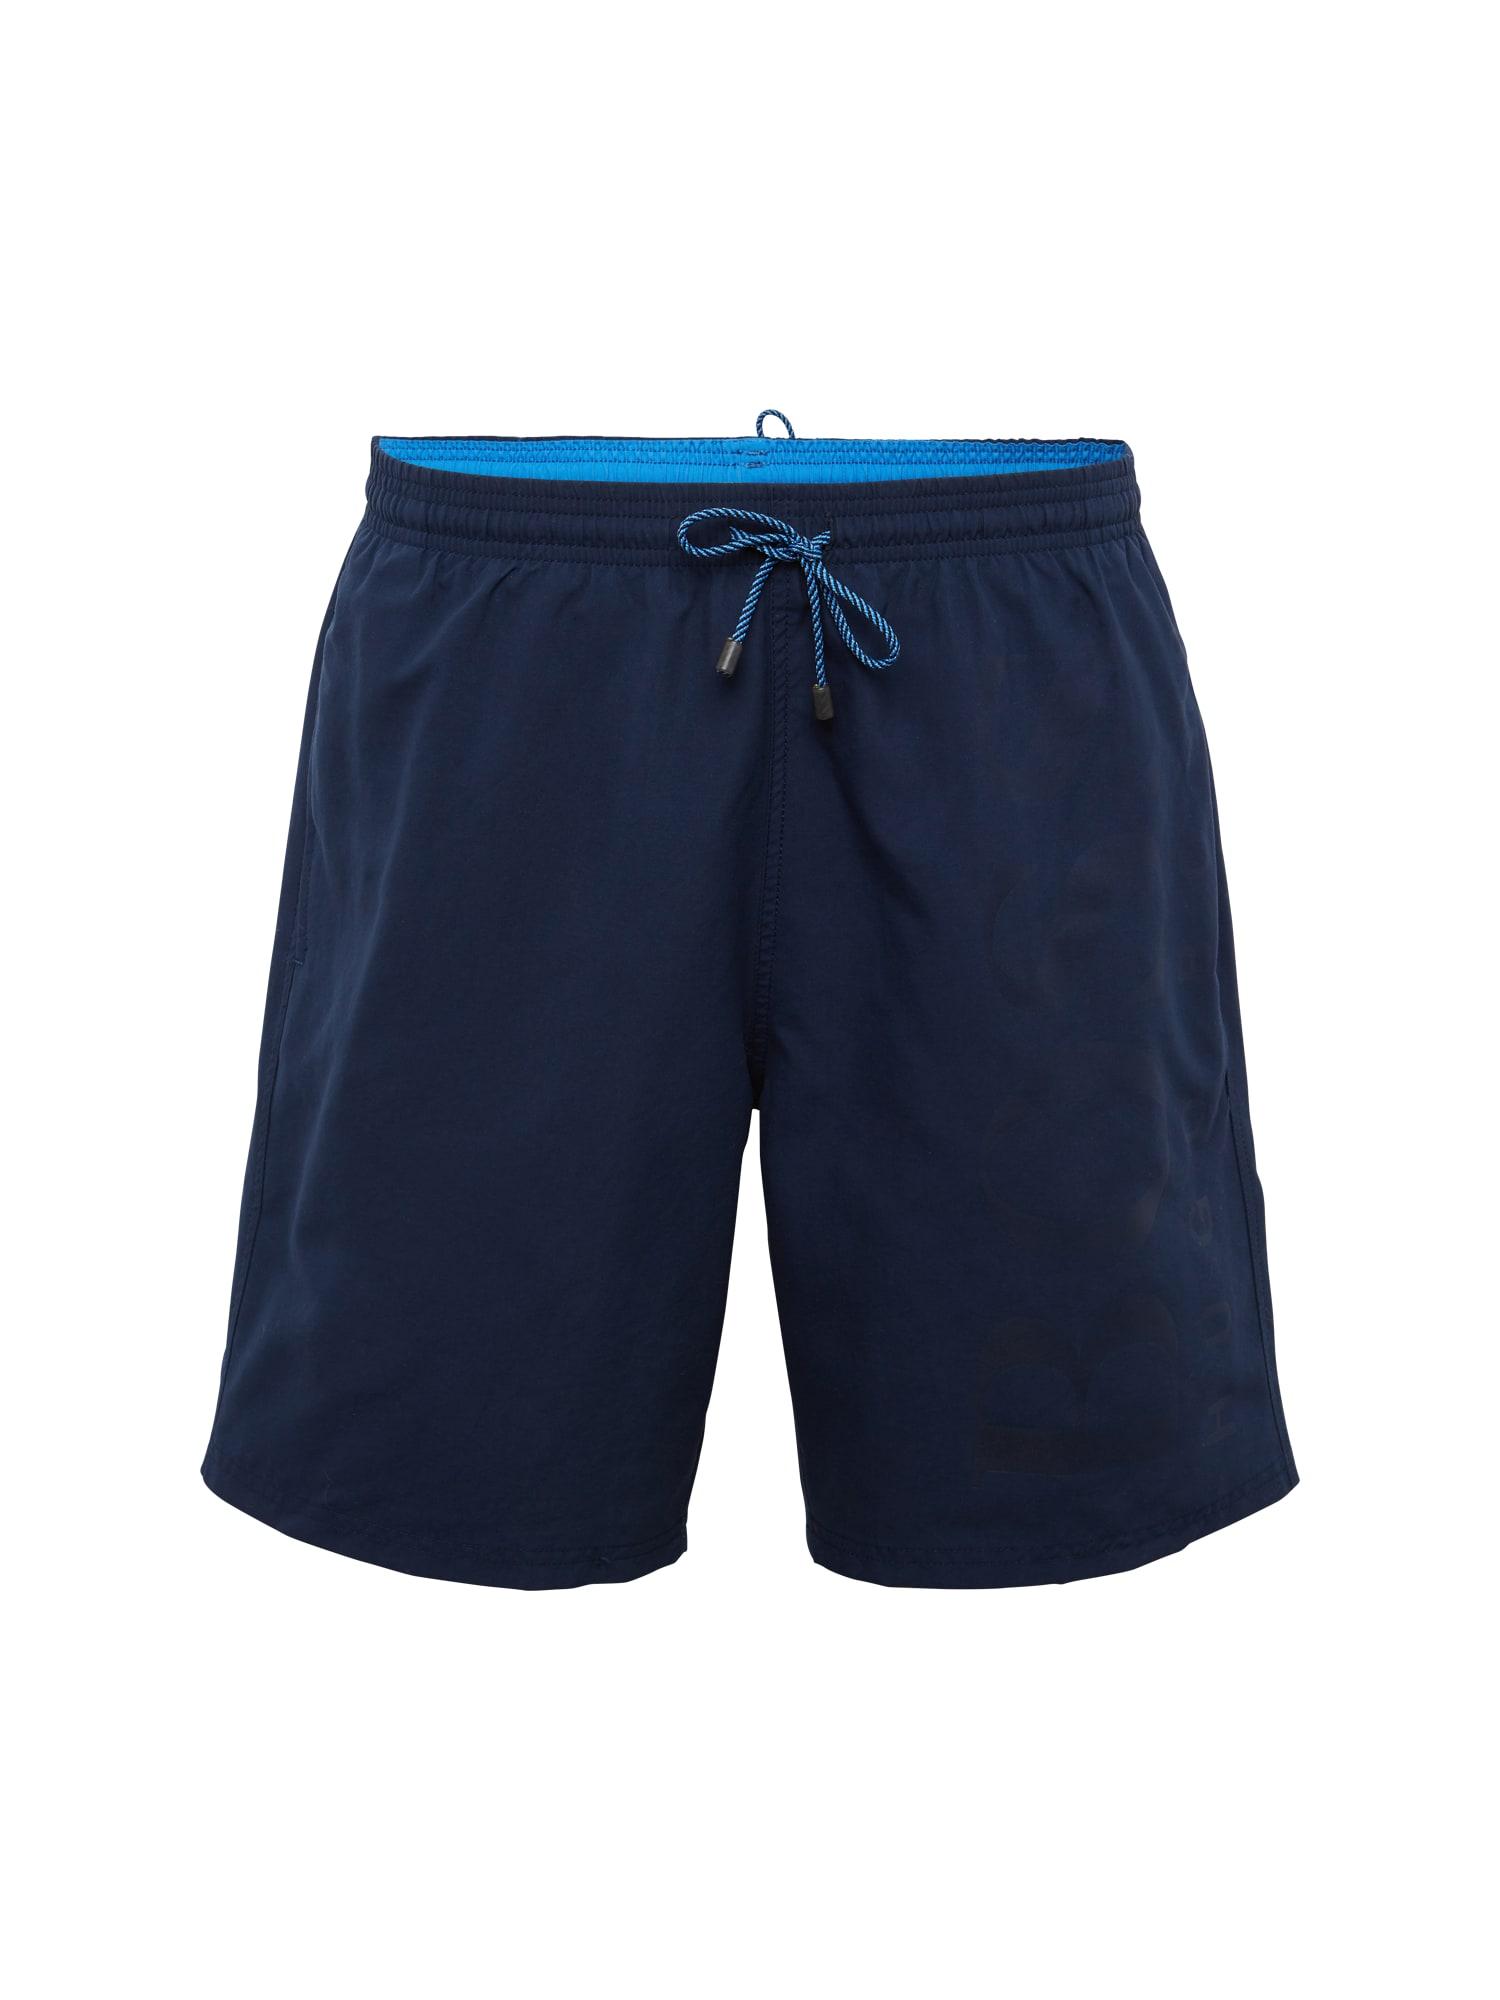 Plavecké šortky BORCA tmavě modrá BOSS